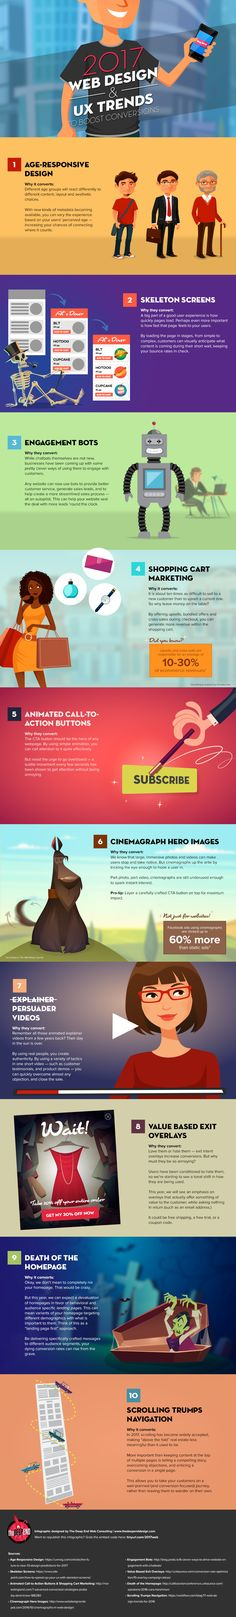 10 poderosas tendencias en diseño web #design #diseño